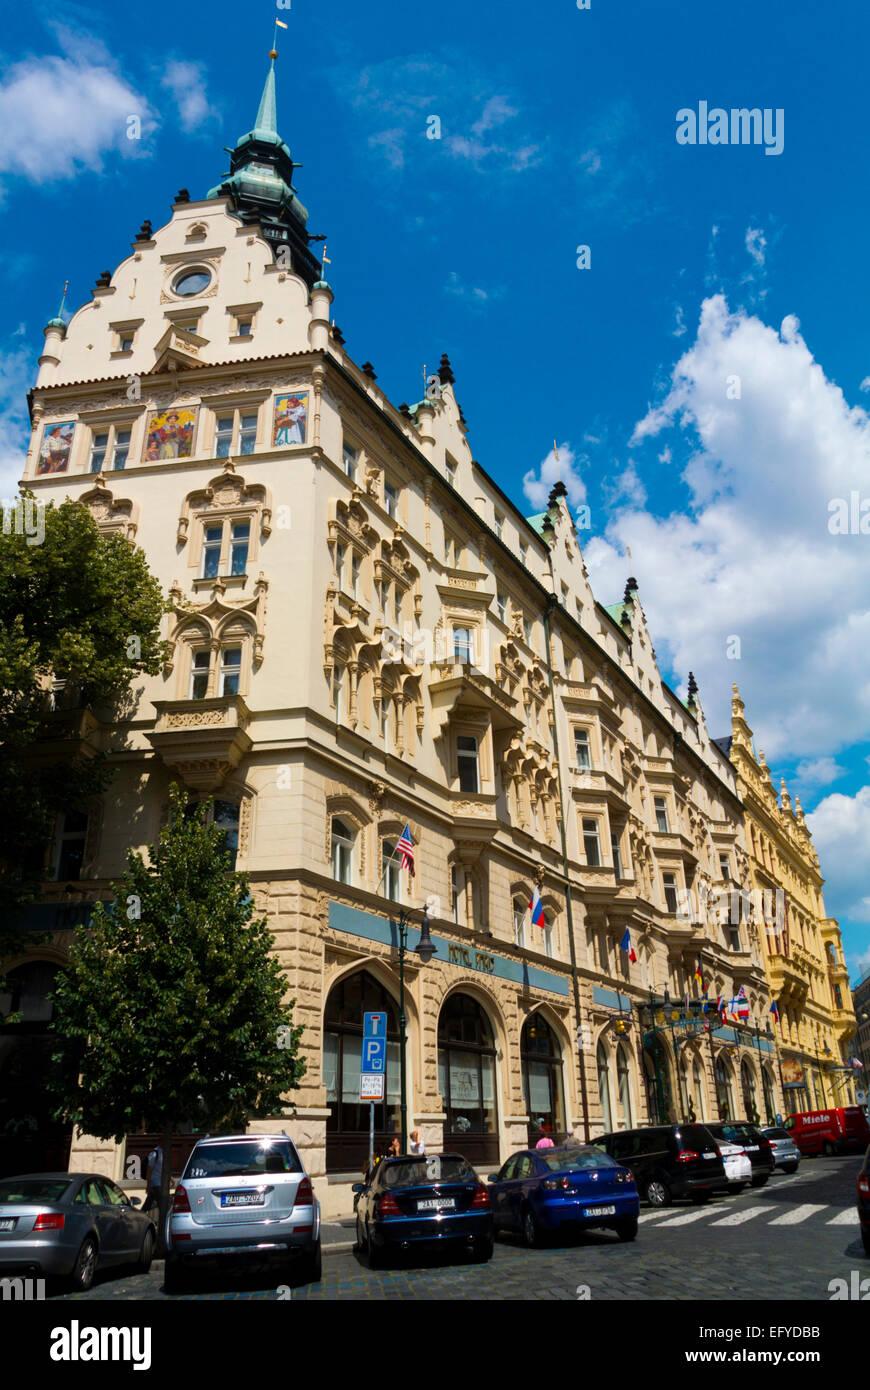 Hotel Paris (1904), Art Nouveau style hotel and cafe, old town, Prague, Czech Republic, Europe - Stock Image